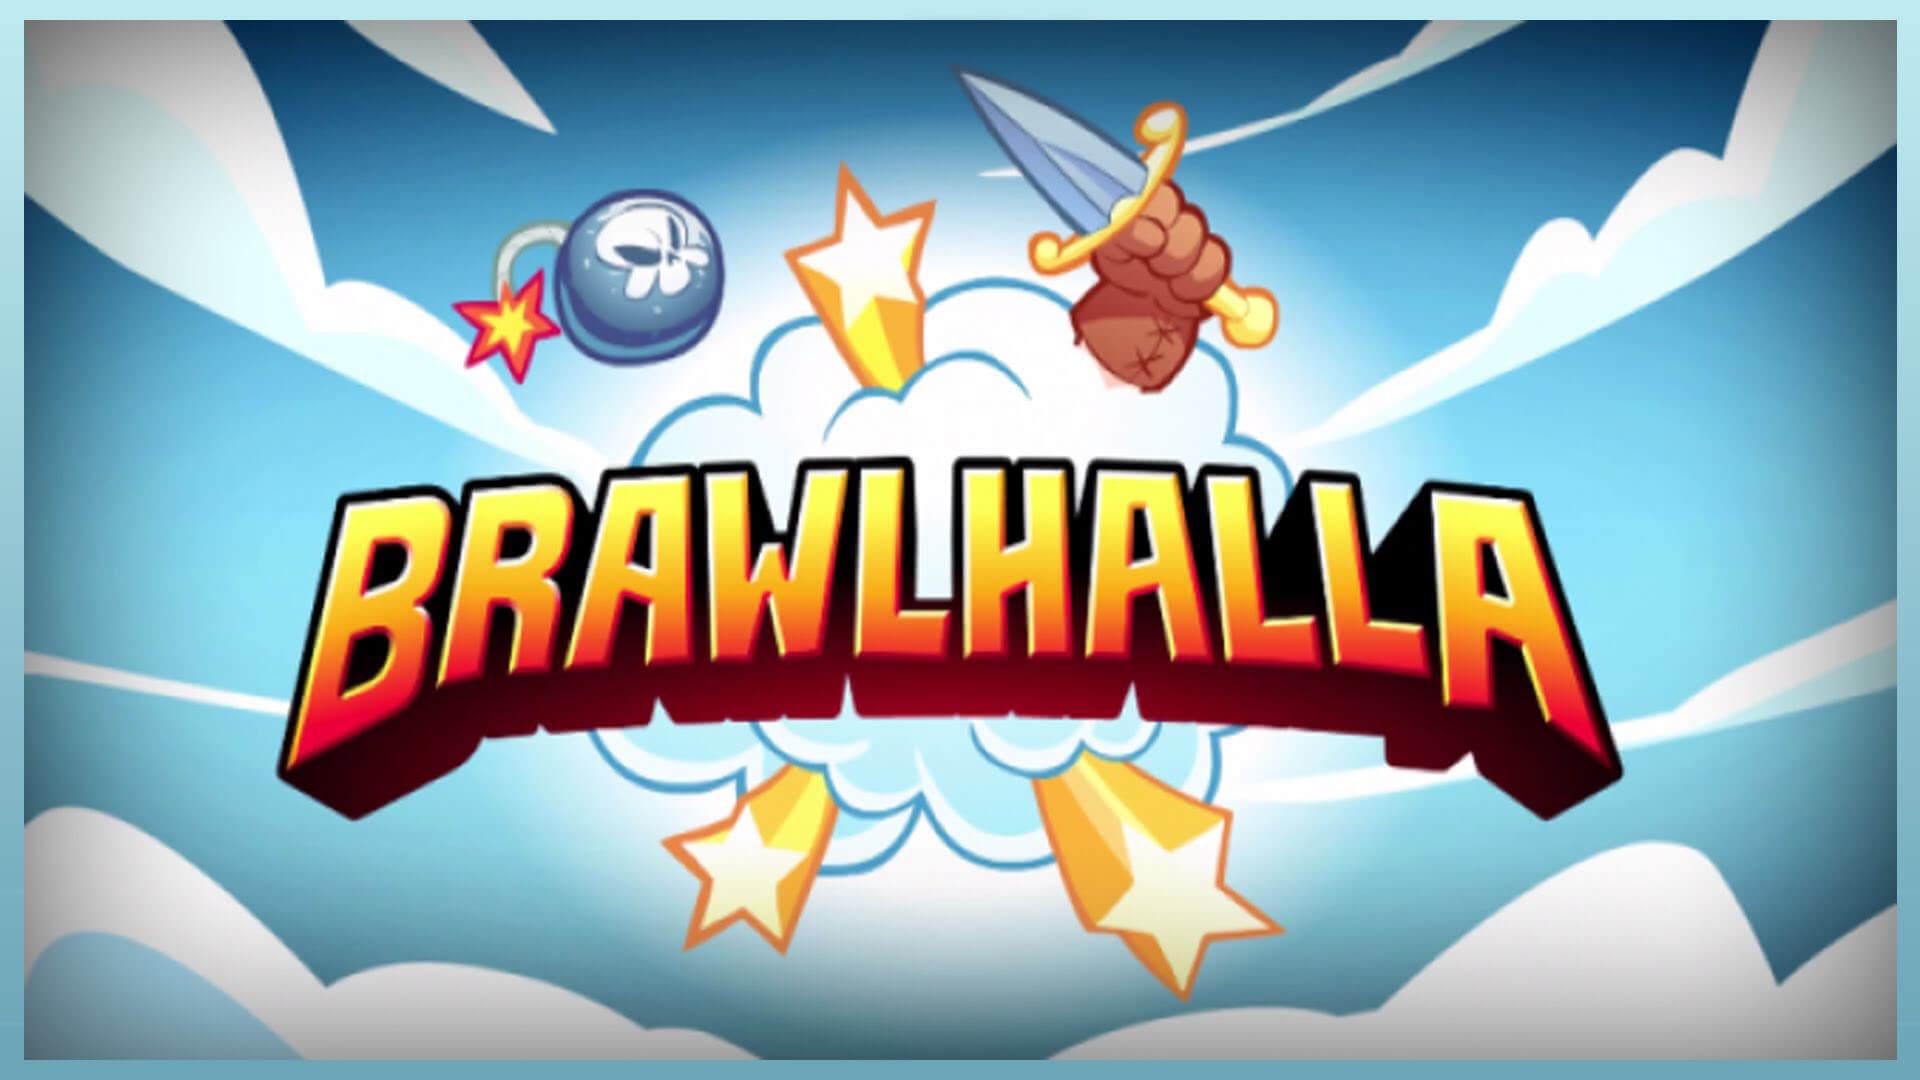 braawlhalla